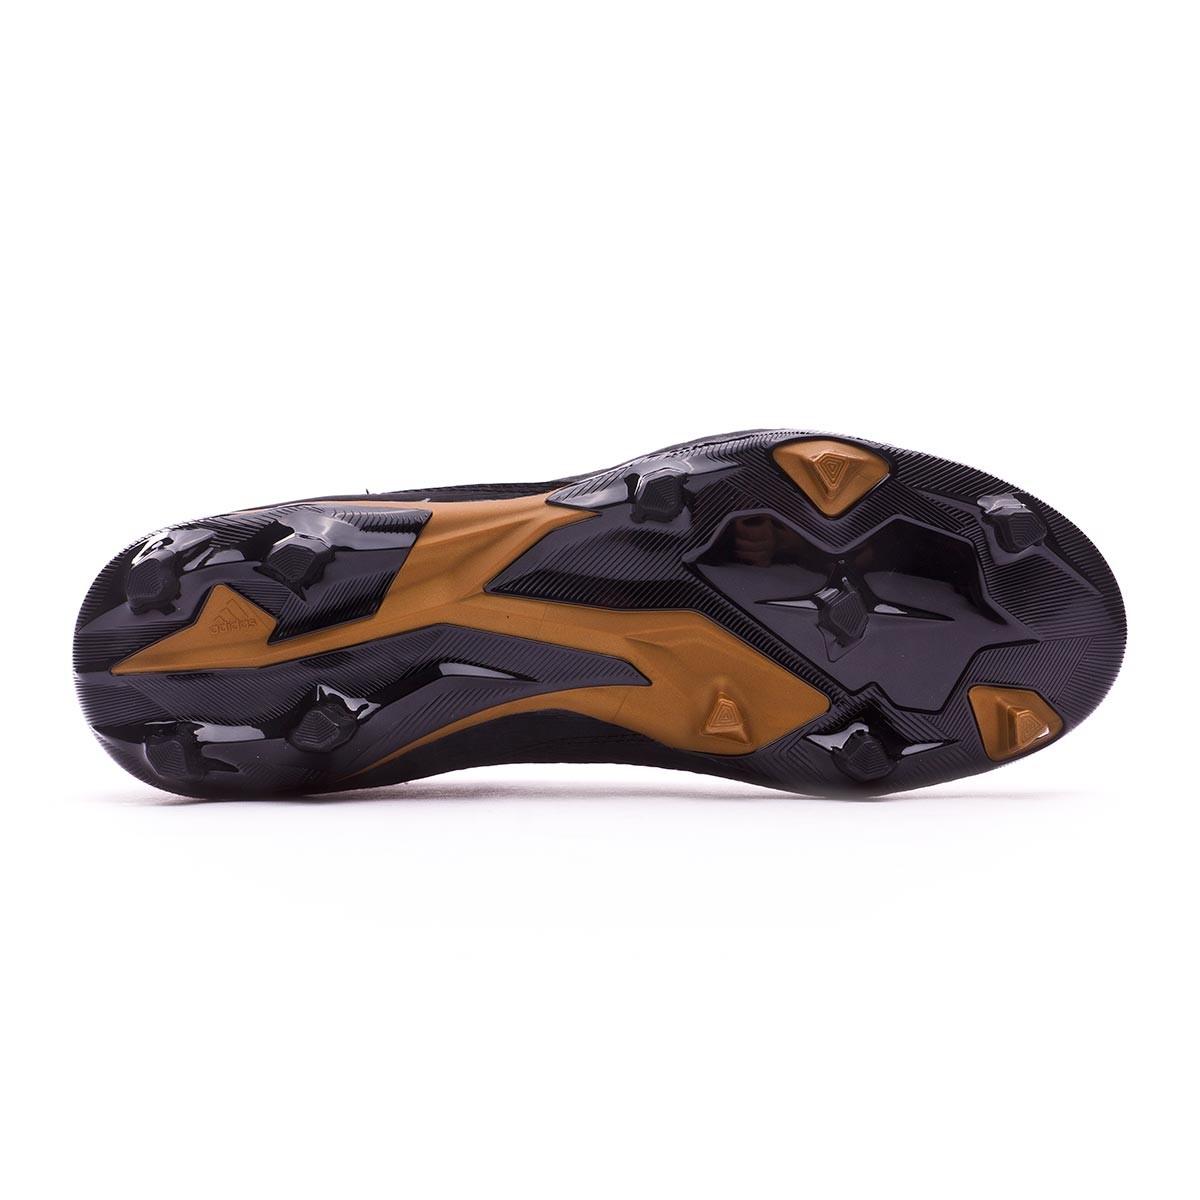 Bota de fútbol adidas Predator 18.3 FG Core black-White-Gold ... 311a38eeffb6a